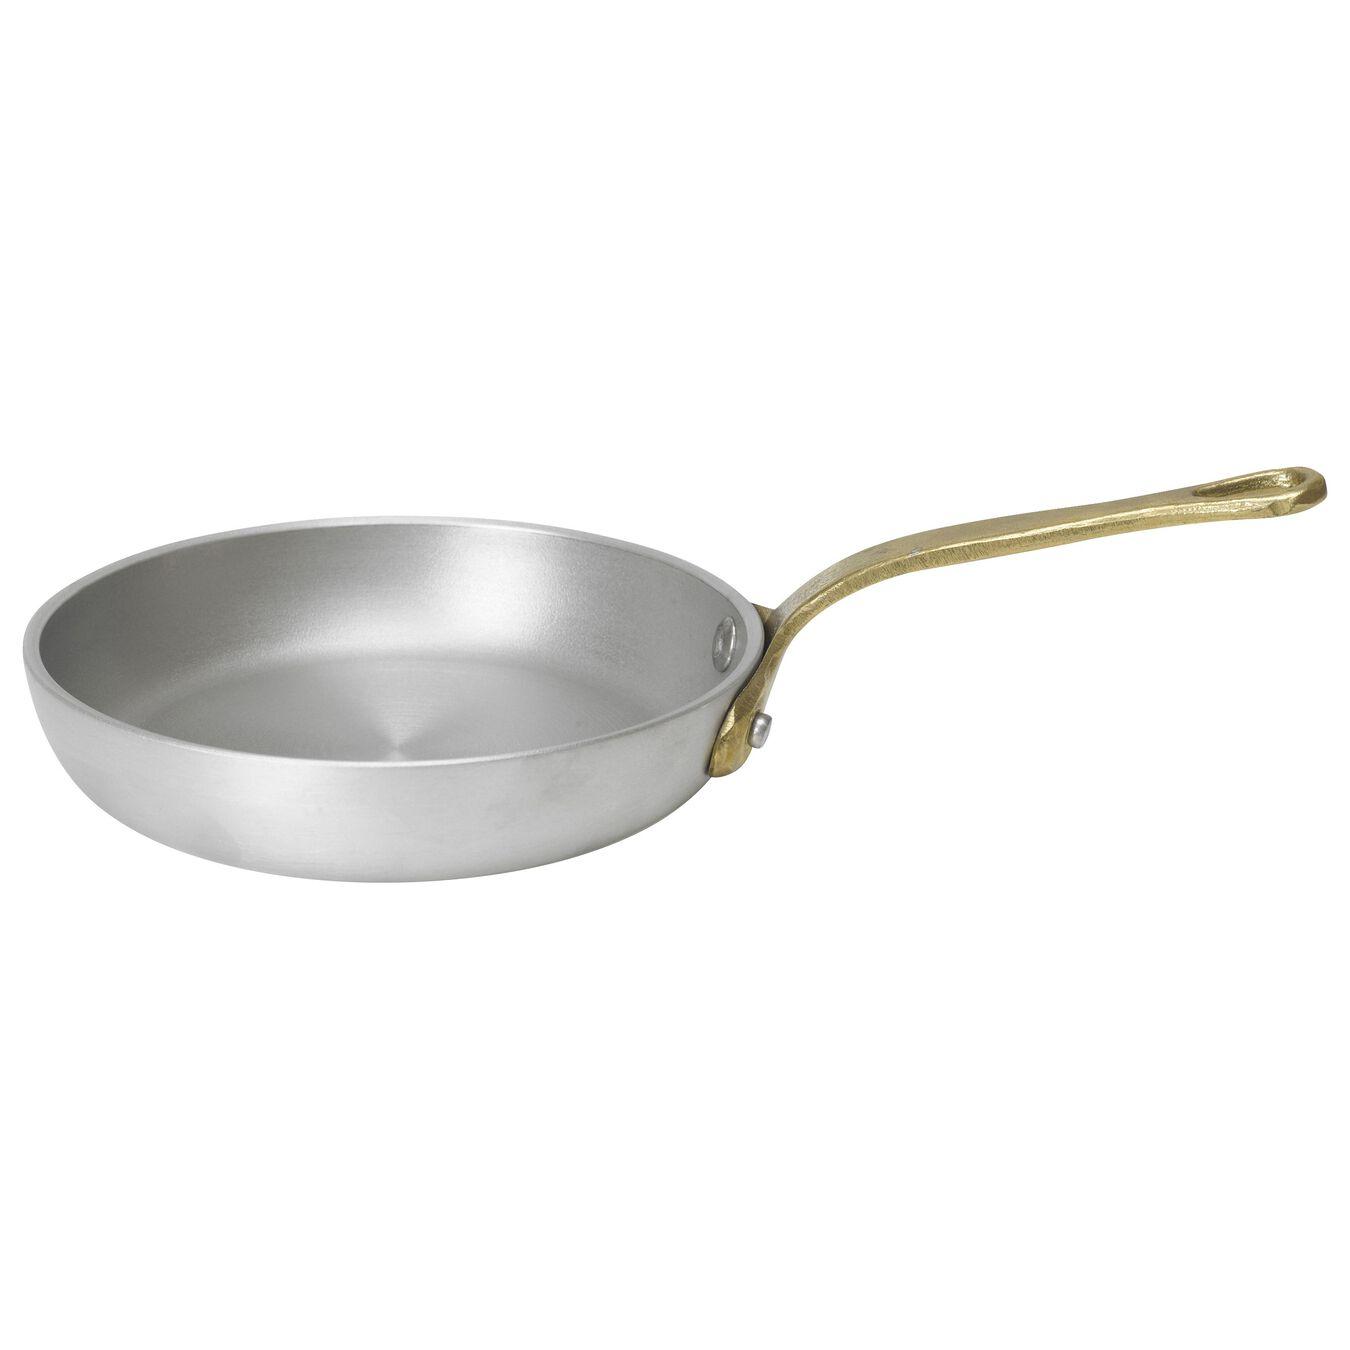 14 cm / 5.5 inch Frying pan,,large 1